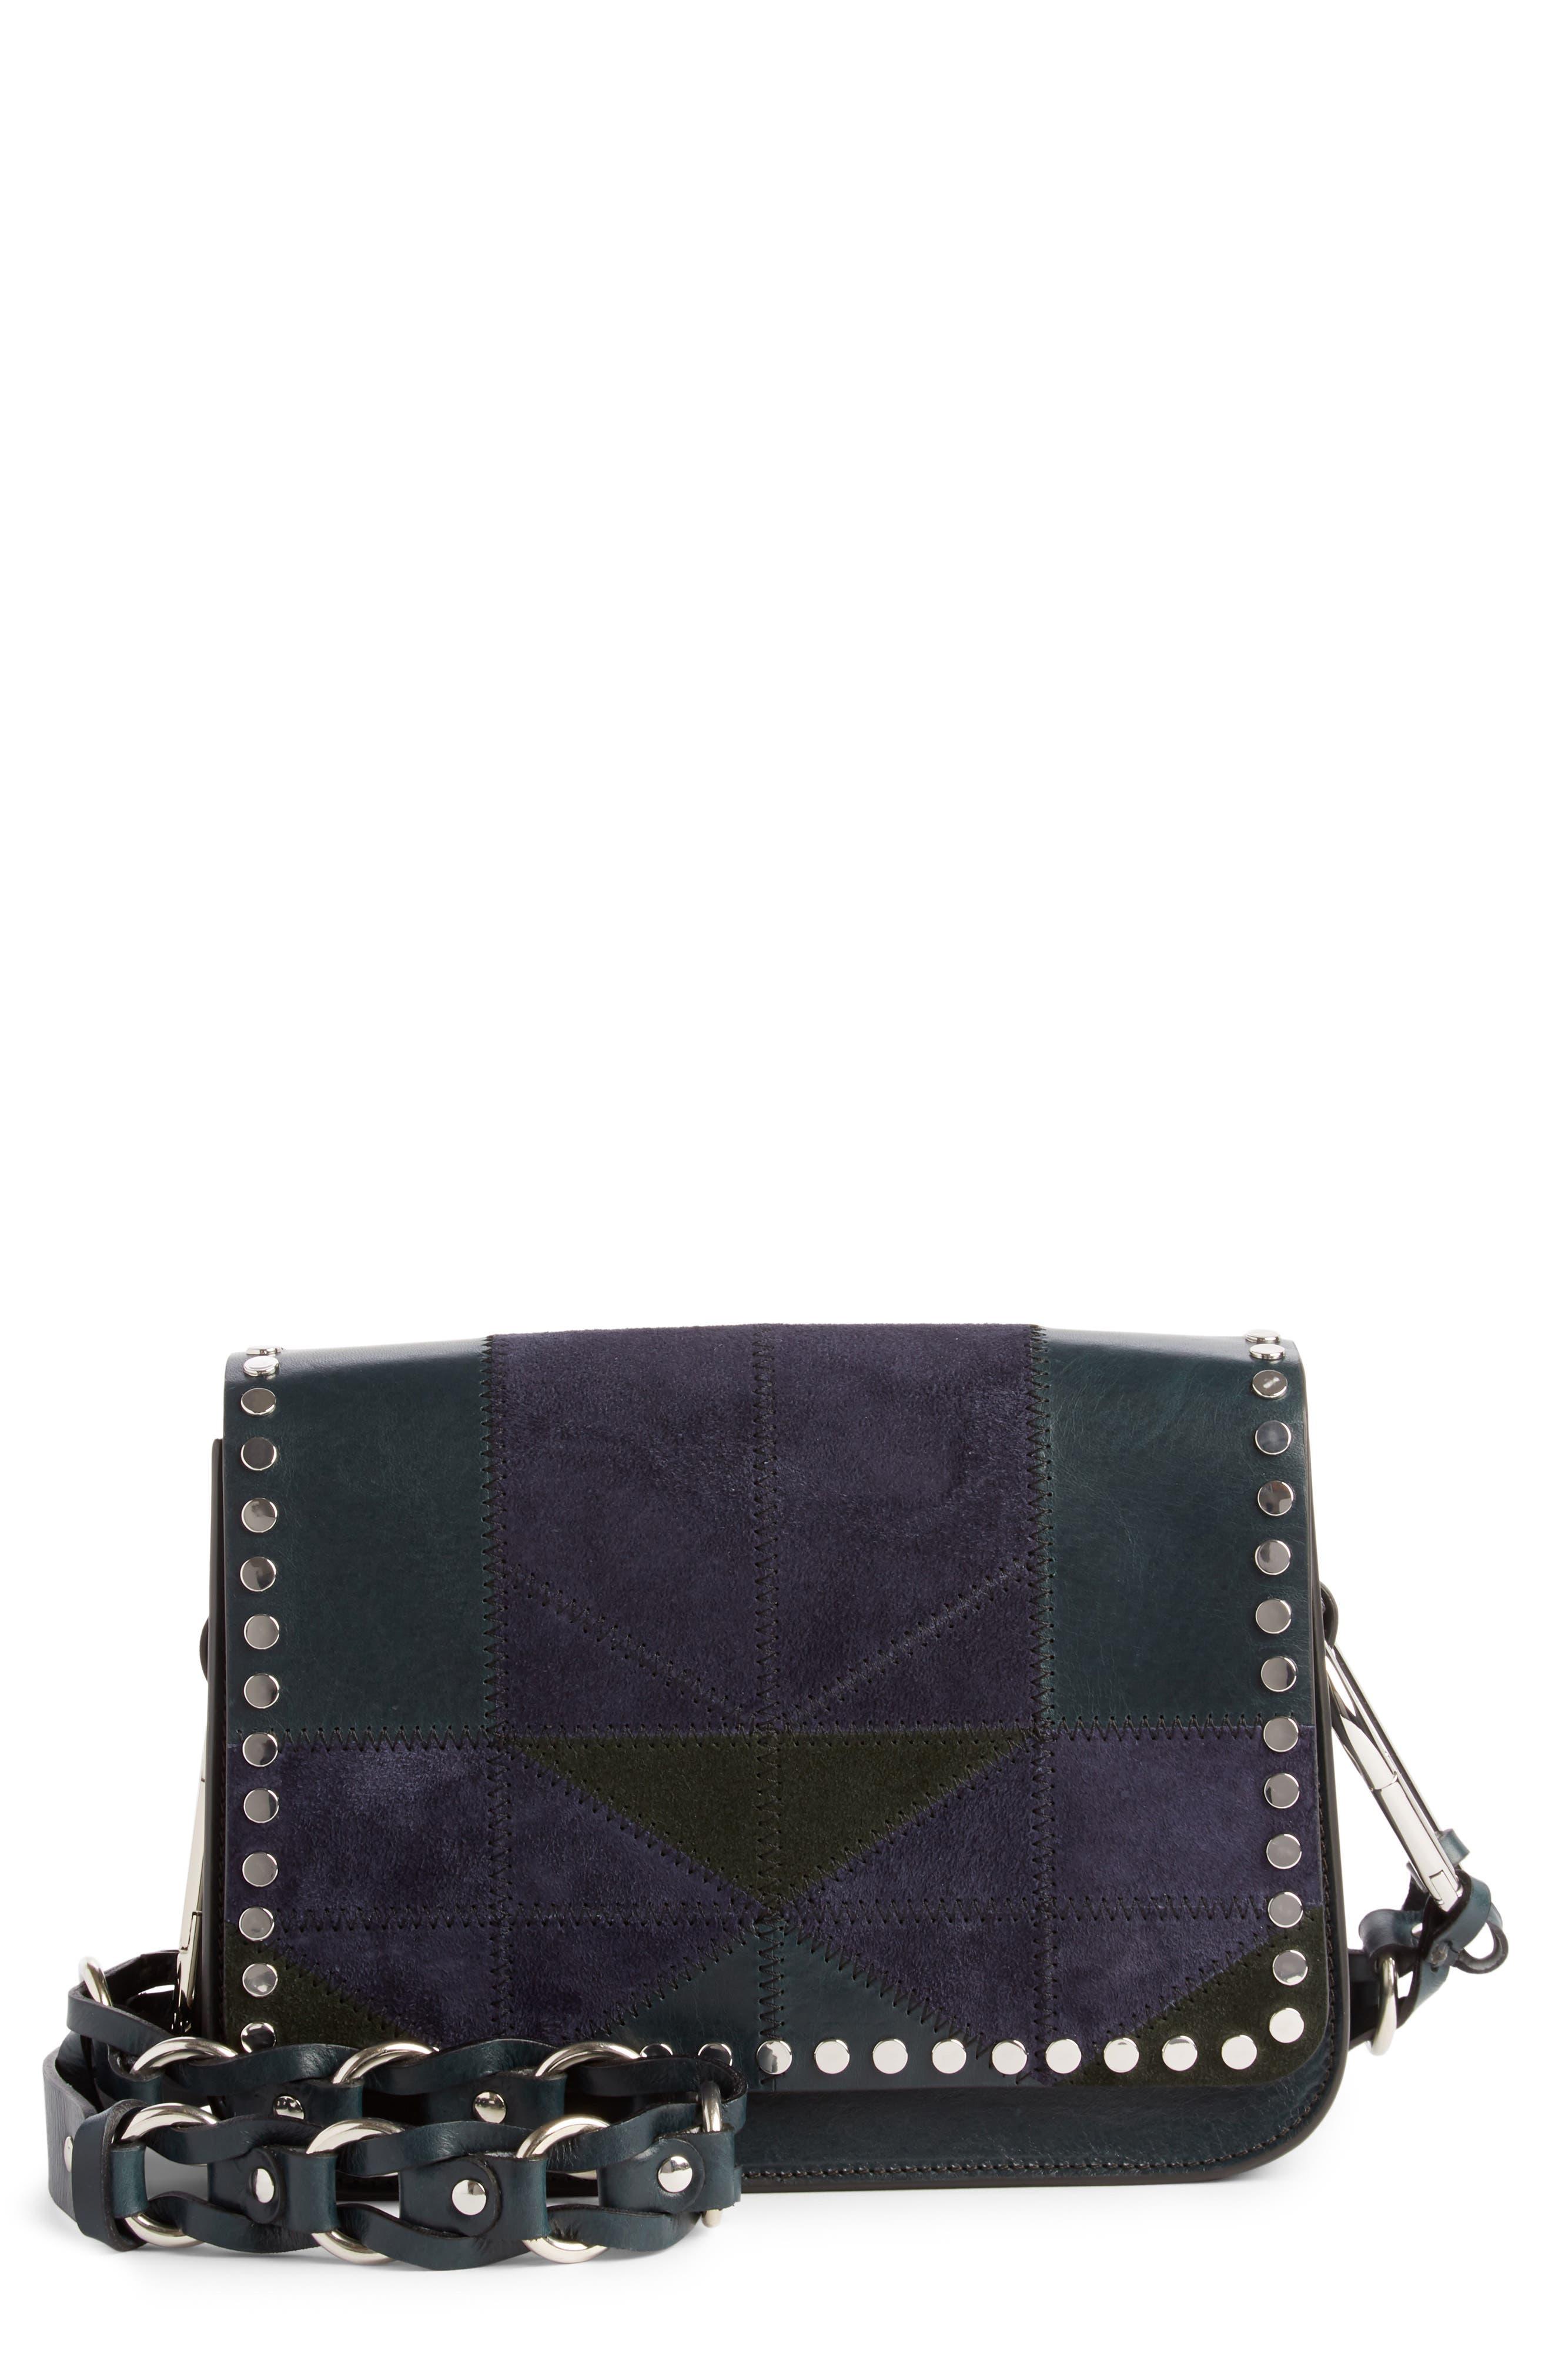 Calibar Patchwork Leather Crossbody Bag,                             Main thumbnail 1, color,